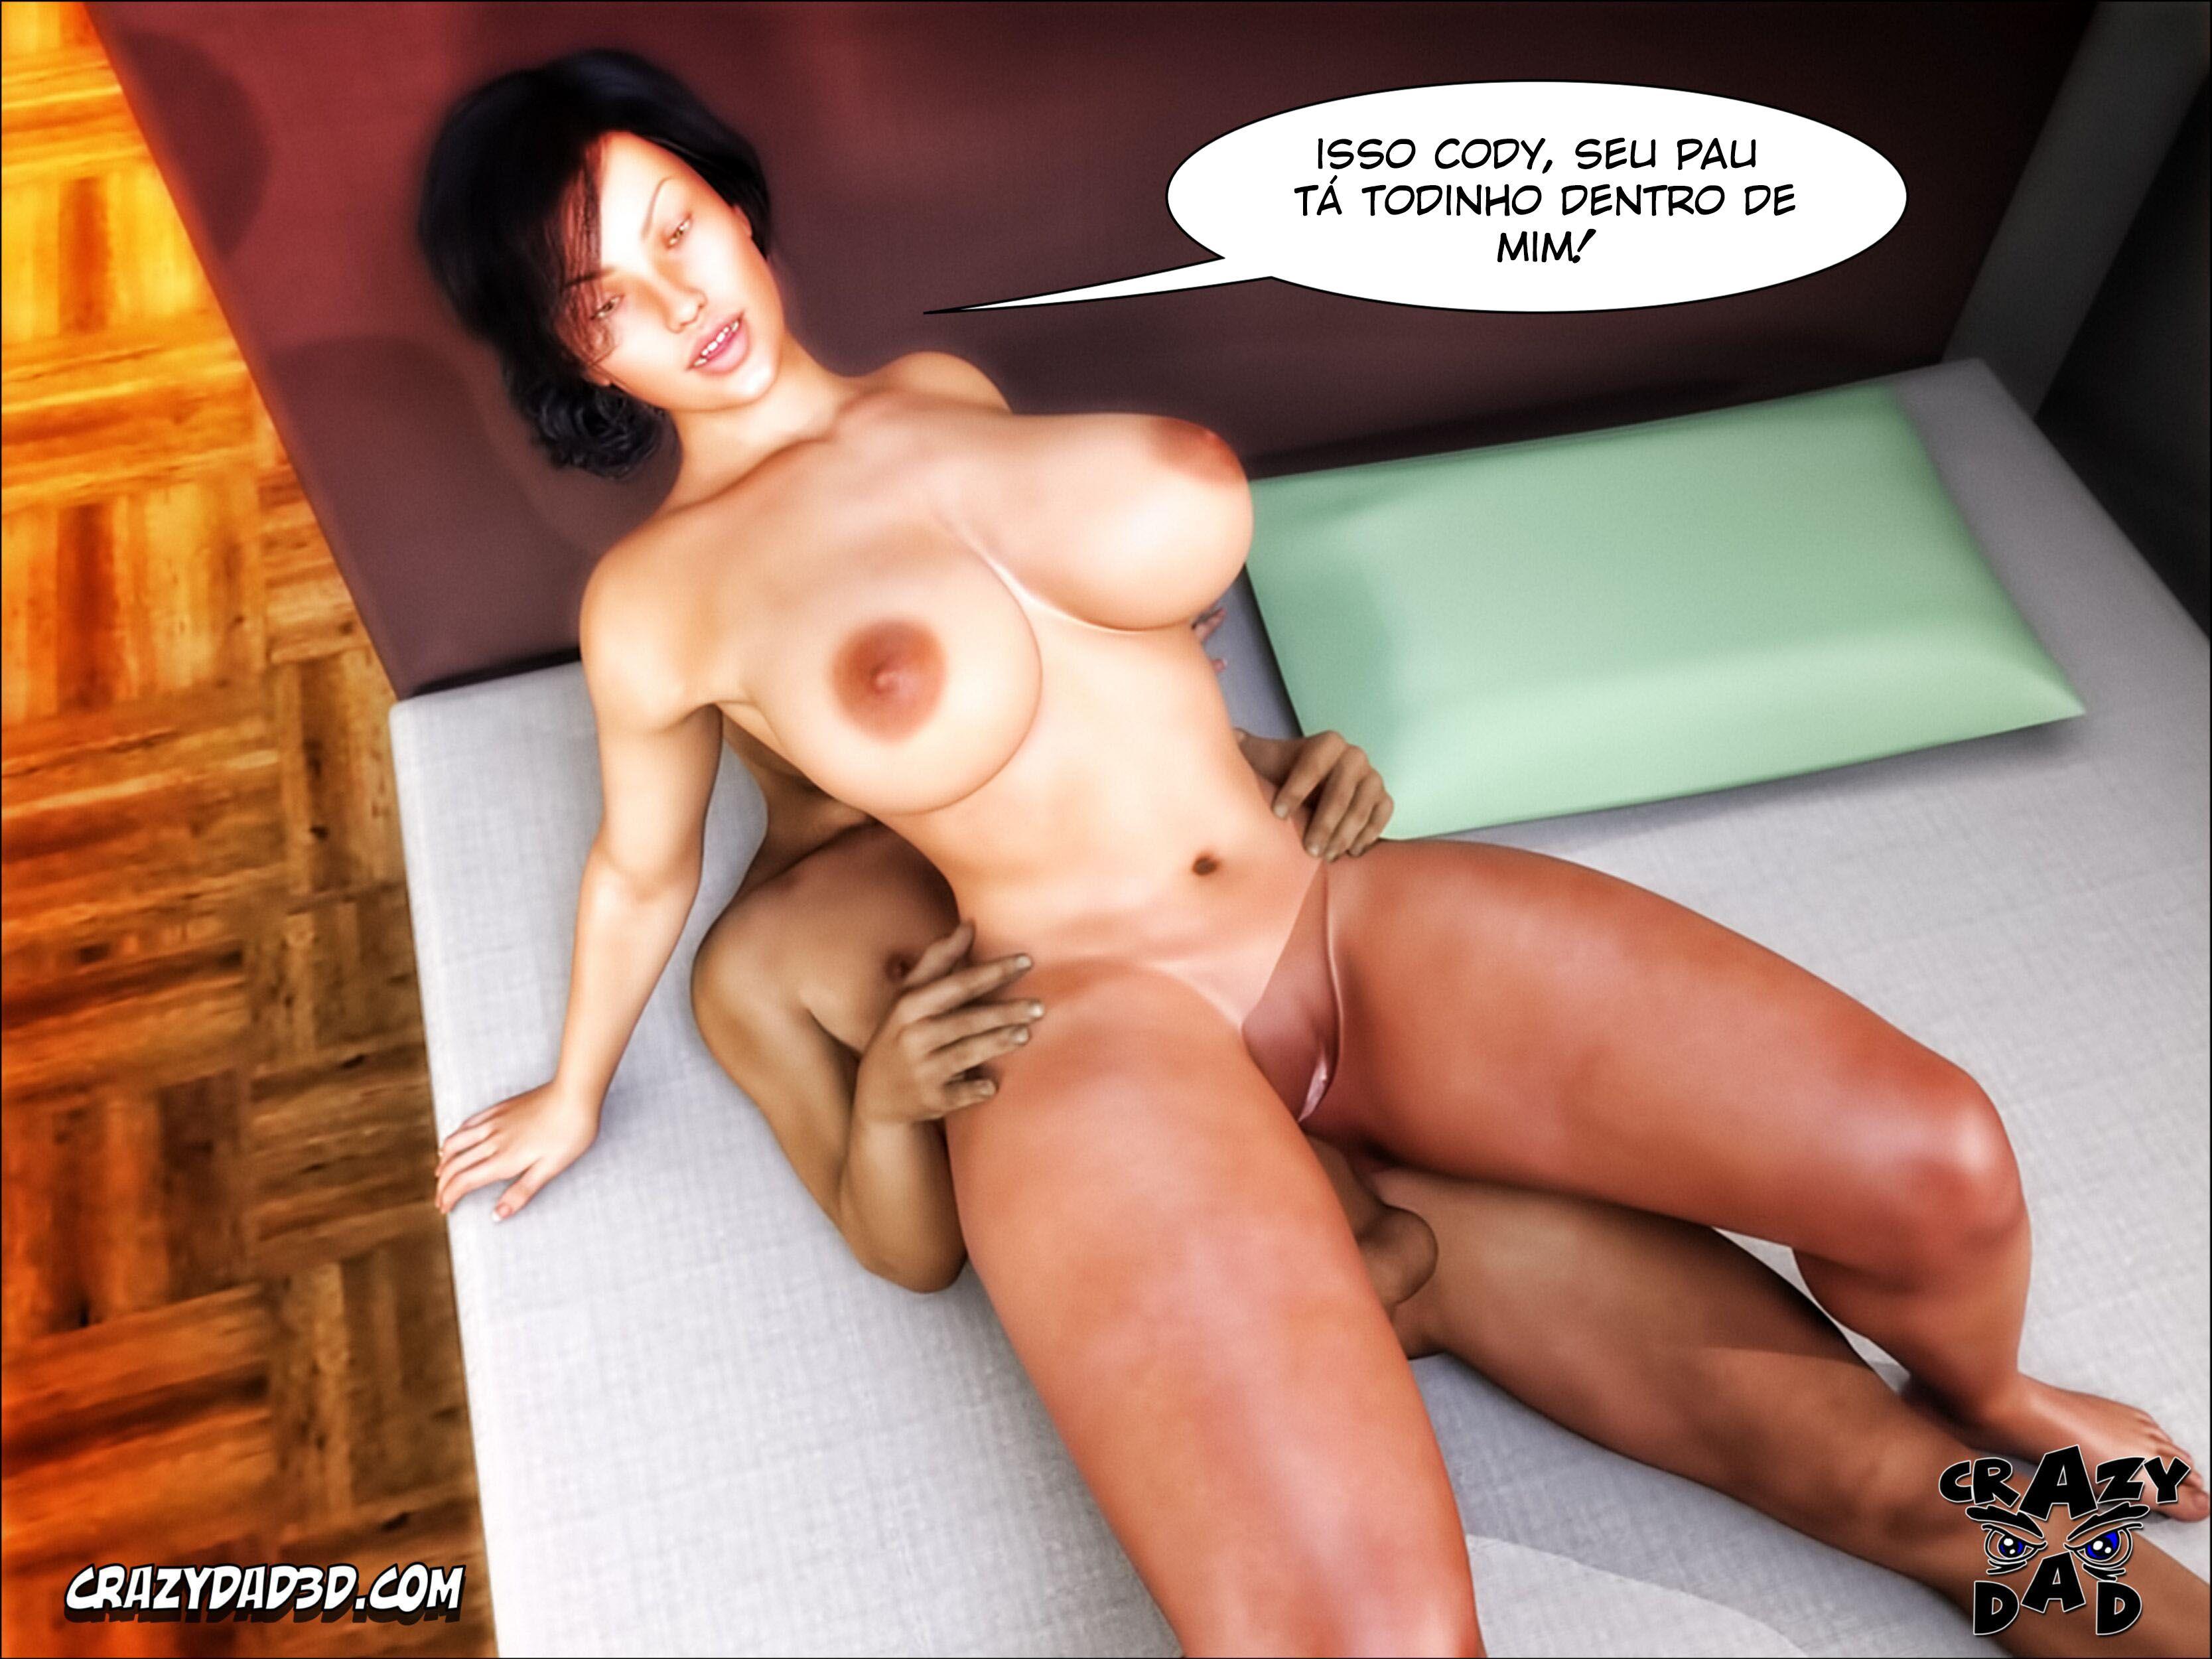 Mãe-desejo-proibido-03-31